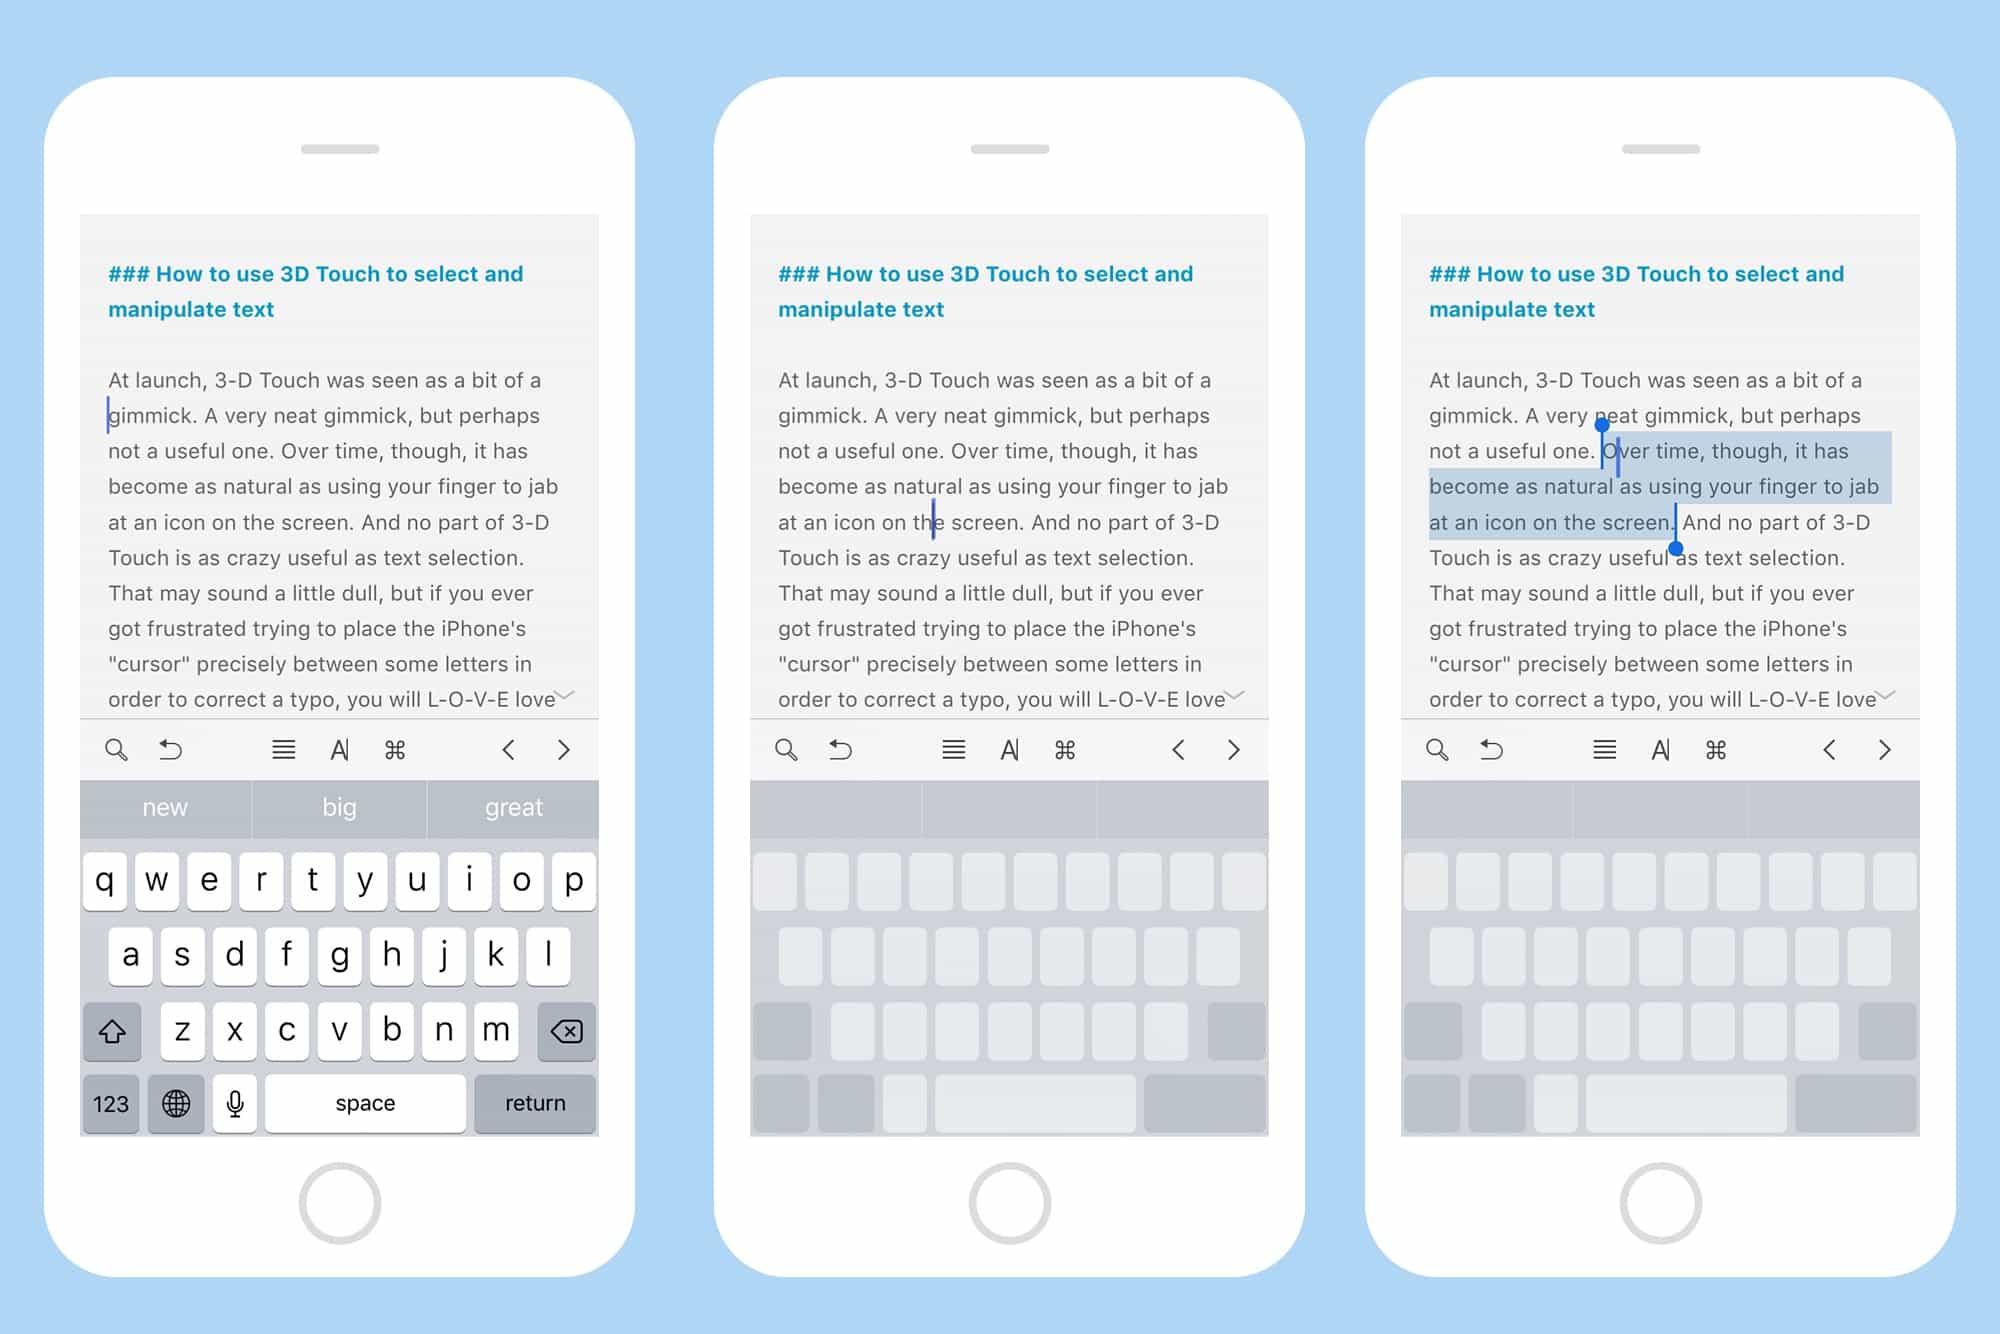 3d-touch-text-selection-iphone.4eec29d24cfc4c57af367ffbbc0c42d8